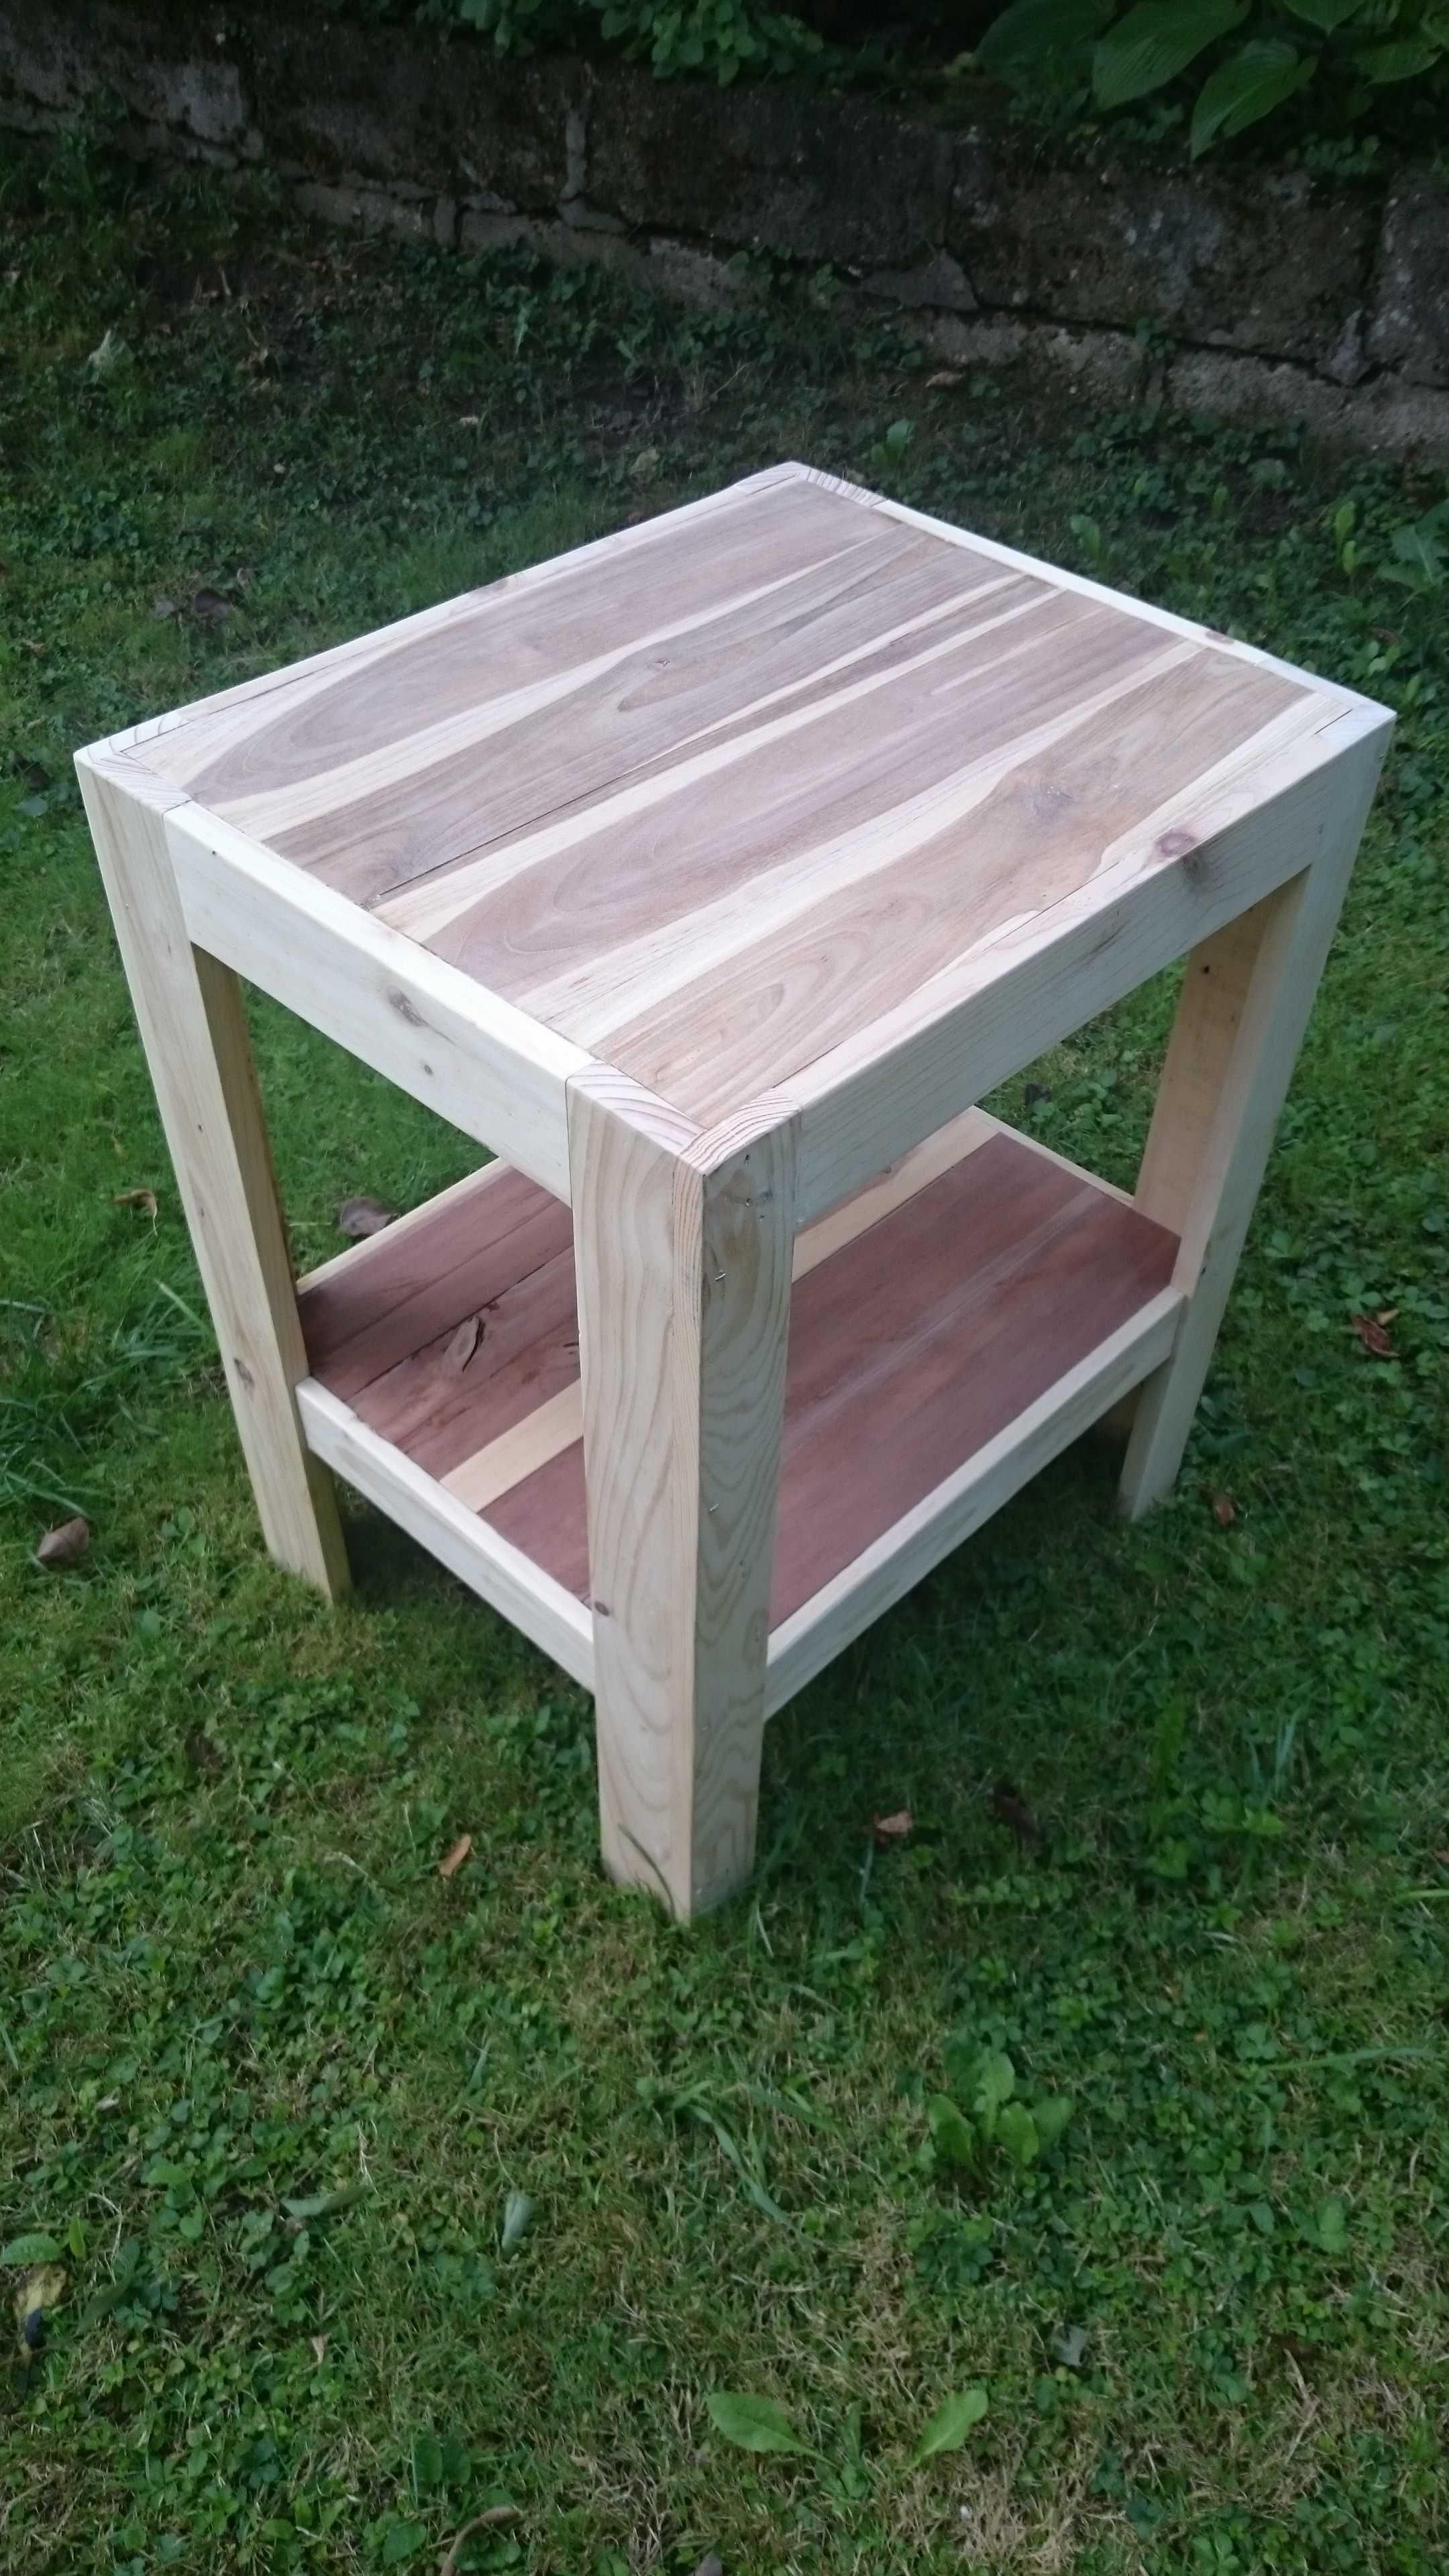 Small Garden Coffee Table 1001 Pallets Small Garden Coffee Table Garden Coffee Table Wooden Pallet Projects [ 3840 x 2160 Pixel ]